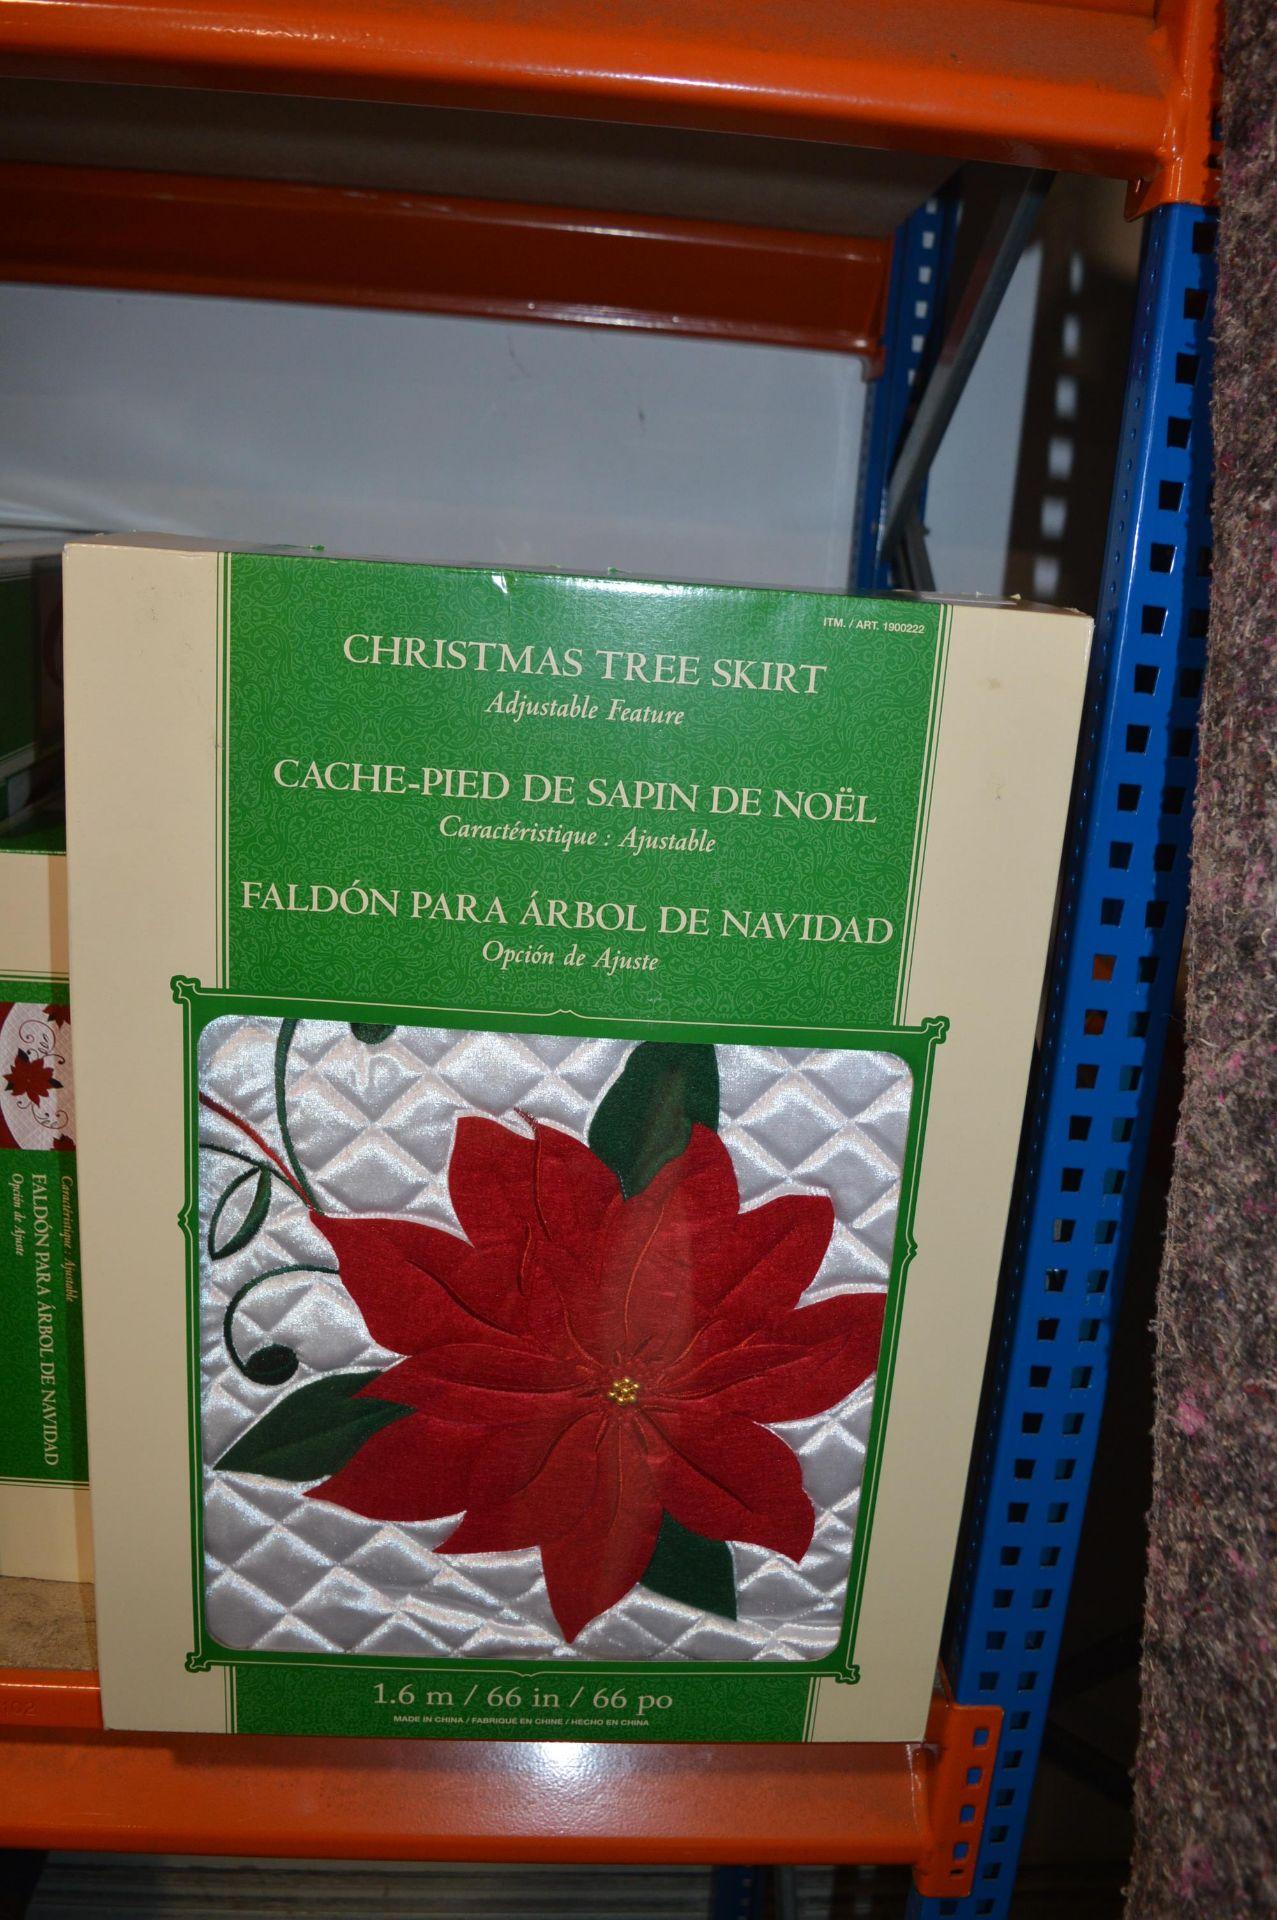 Lot 26 - *Christmas Tree Skirt 1.6m